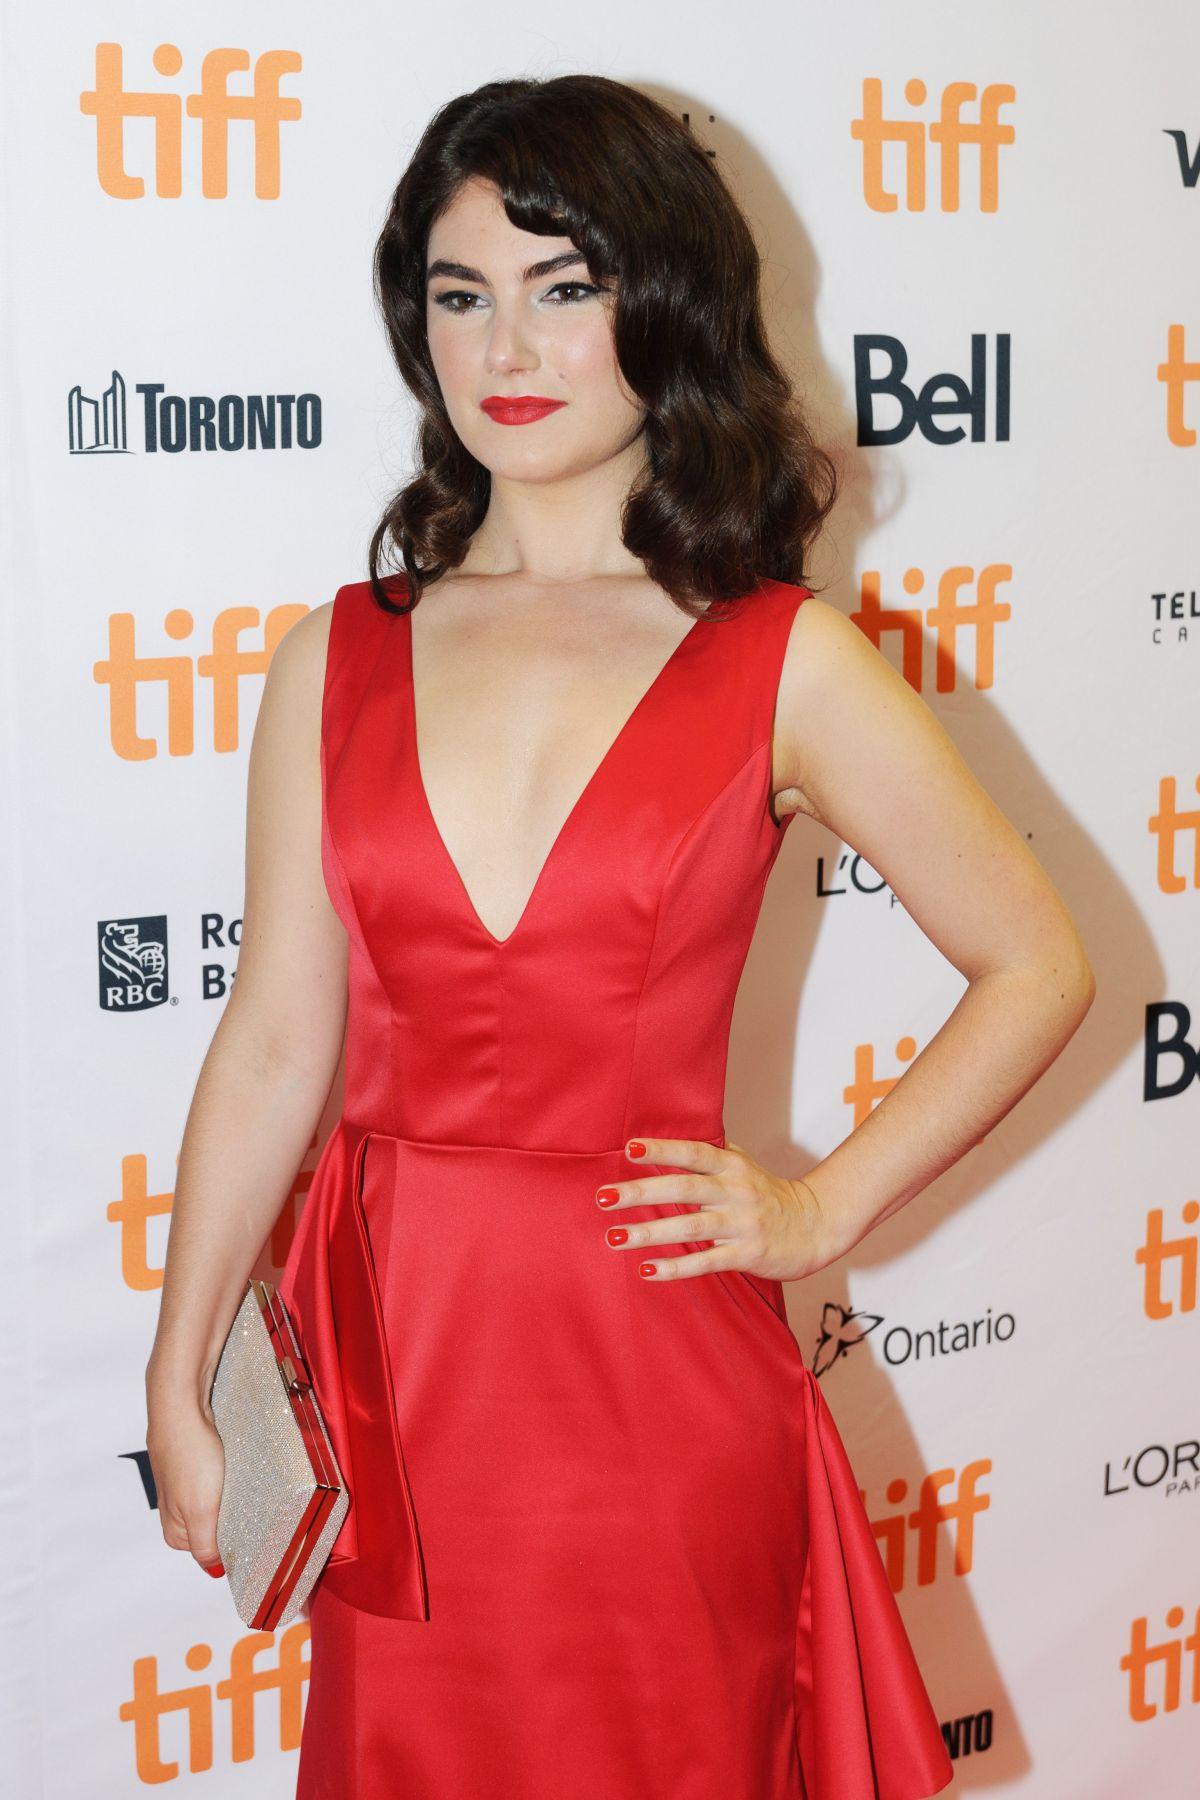 KATIE BOLAND at 2017 Toronto International Film Festival Soiree 09/06/2017